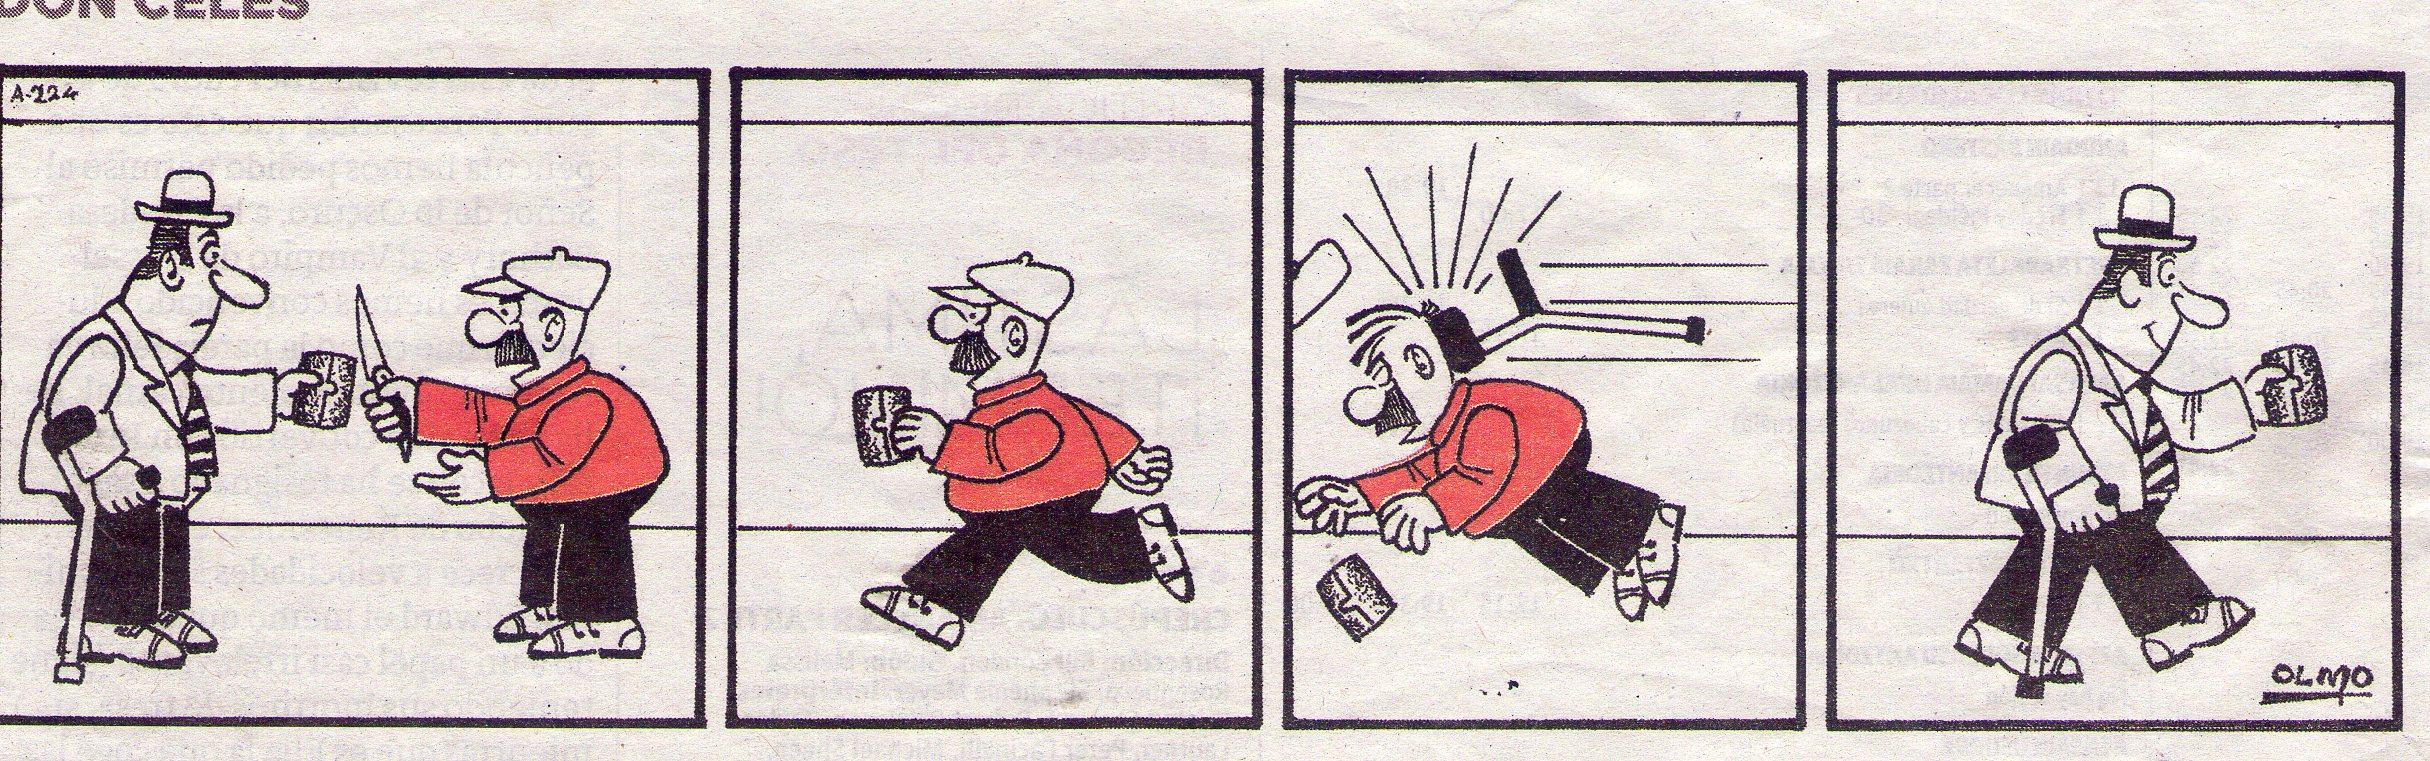 Don Celes asalta a un cojo y éste le da con la muleta